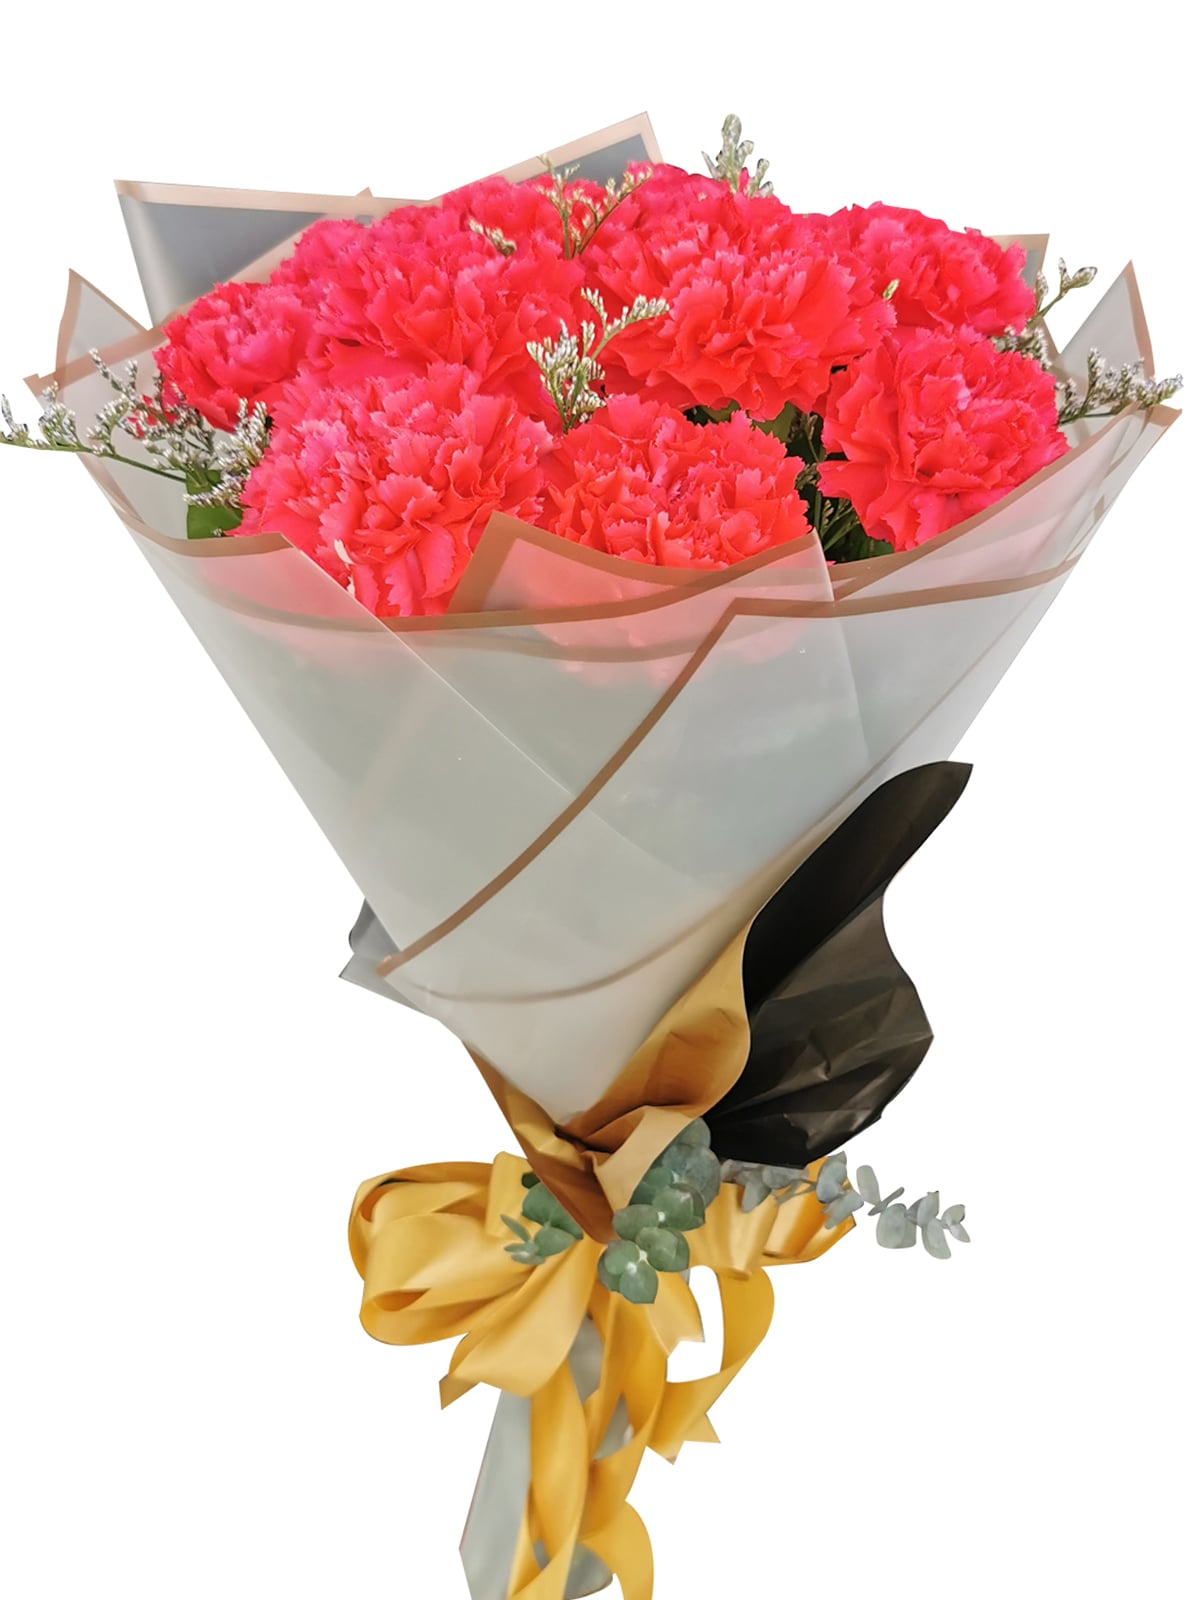 Carnation Fuchsia Pink Korean White bg